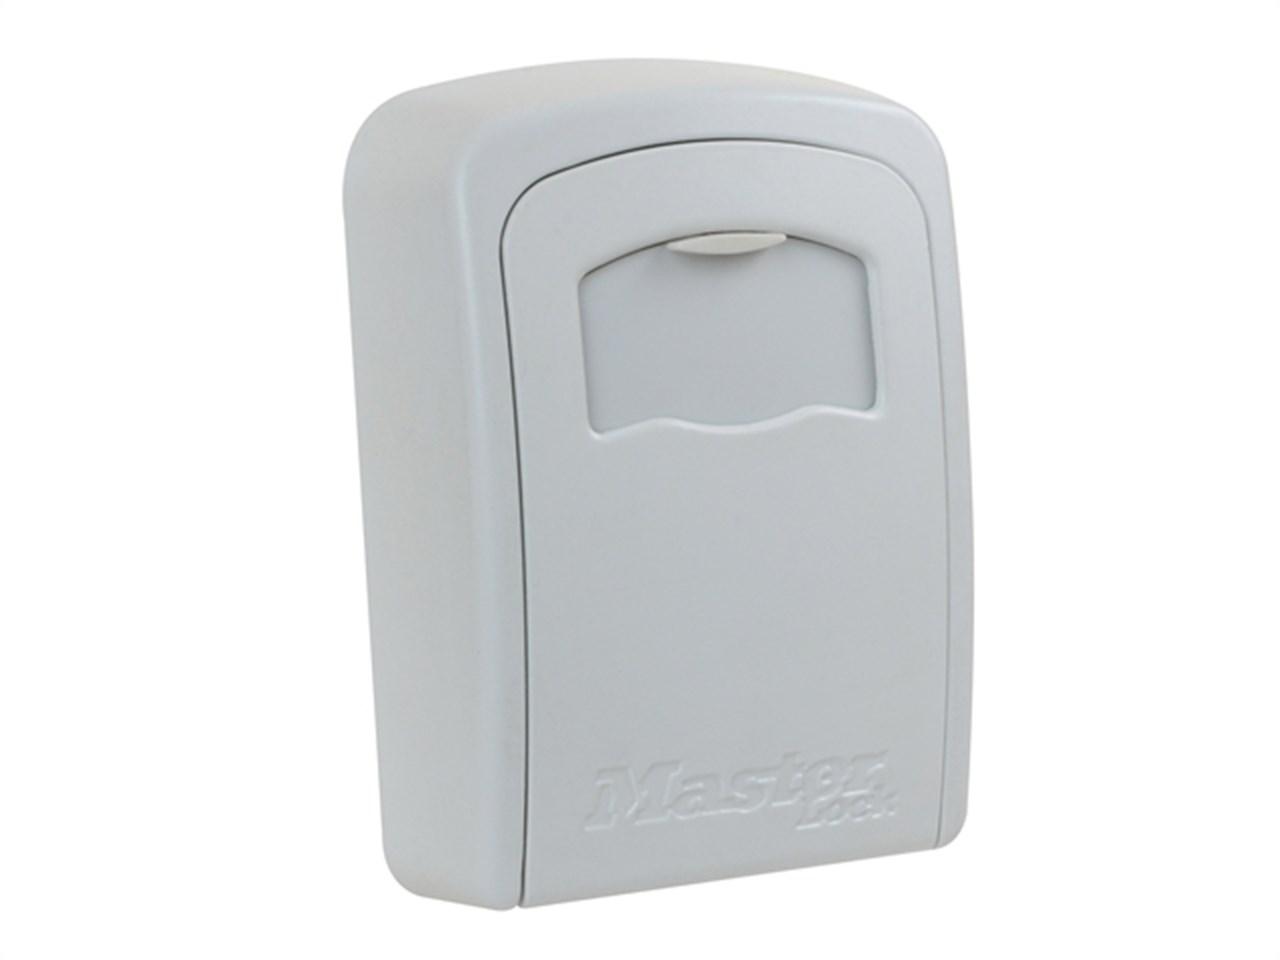 Masterlock 5401eurdcrm Standard Wall Mounted Key Lock Box